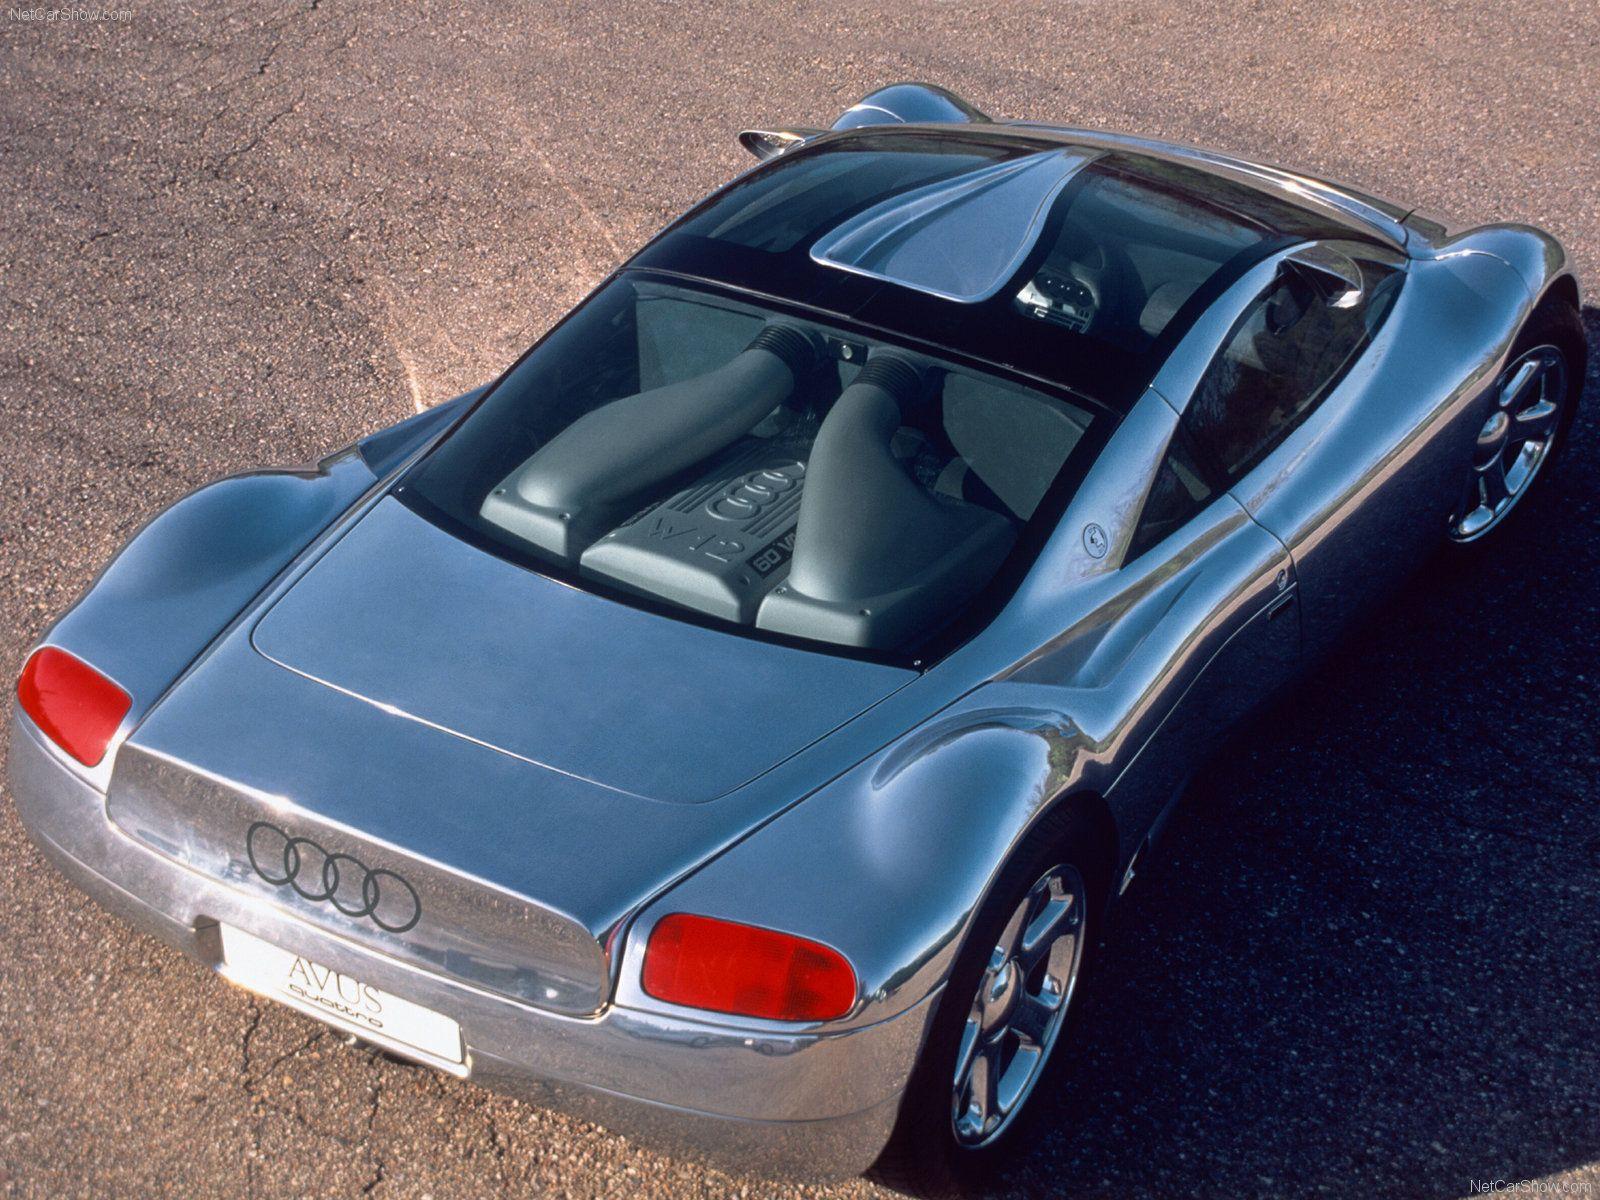 Kelebihan Audi Avus Murah Berkualitas